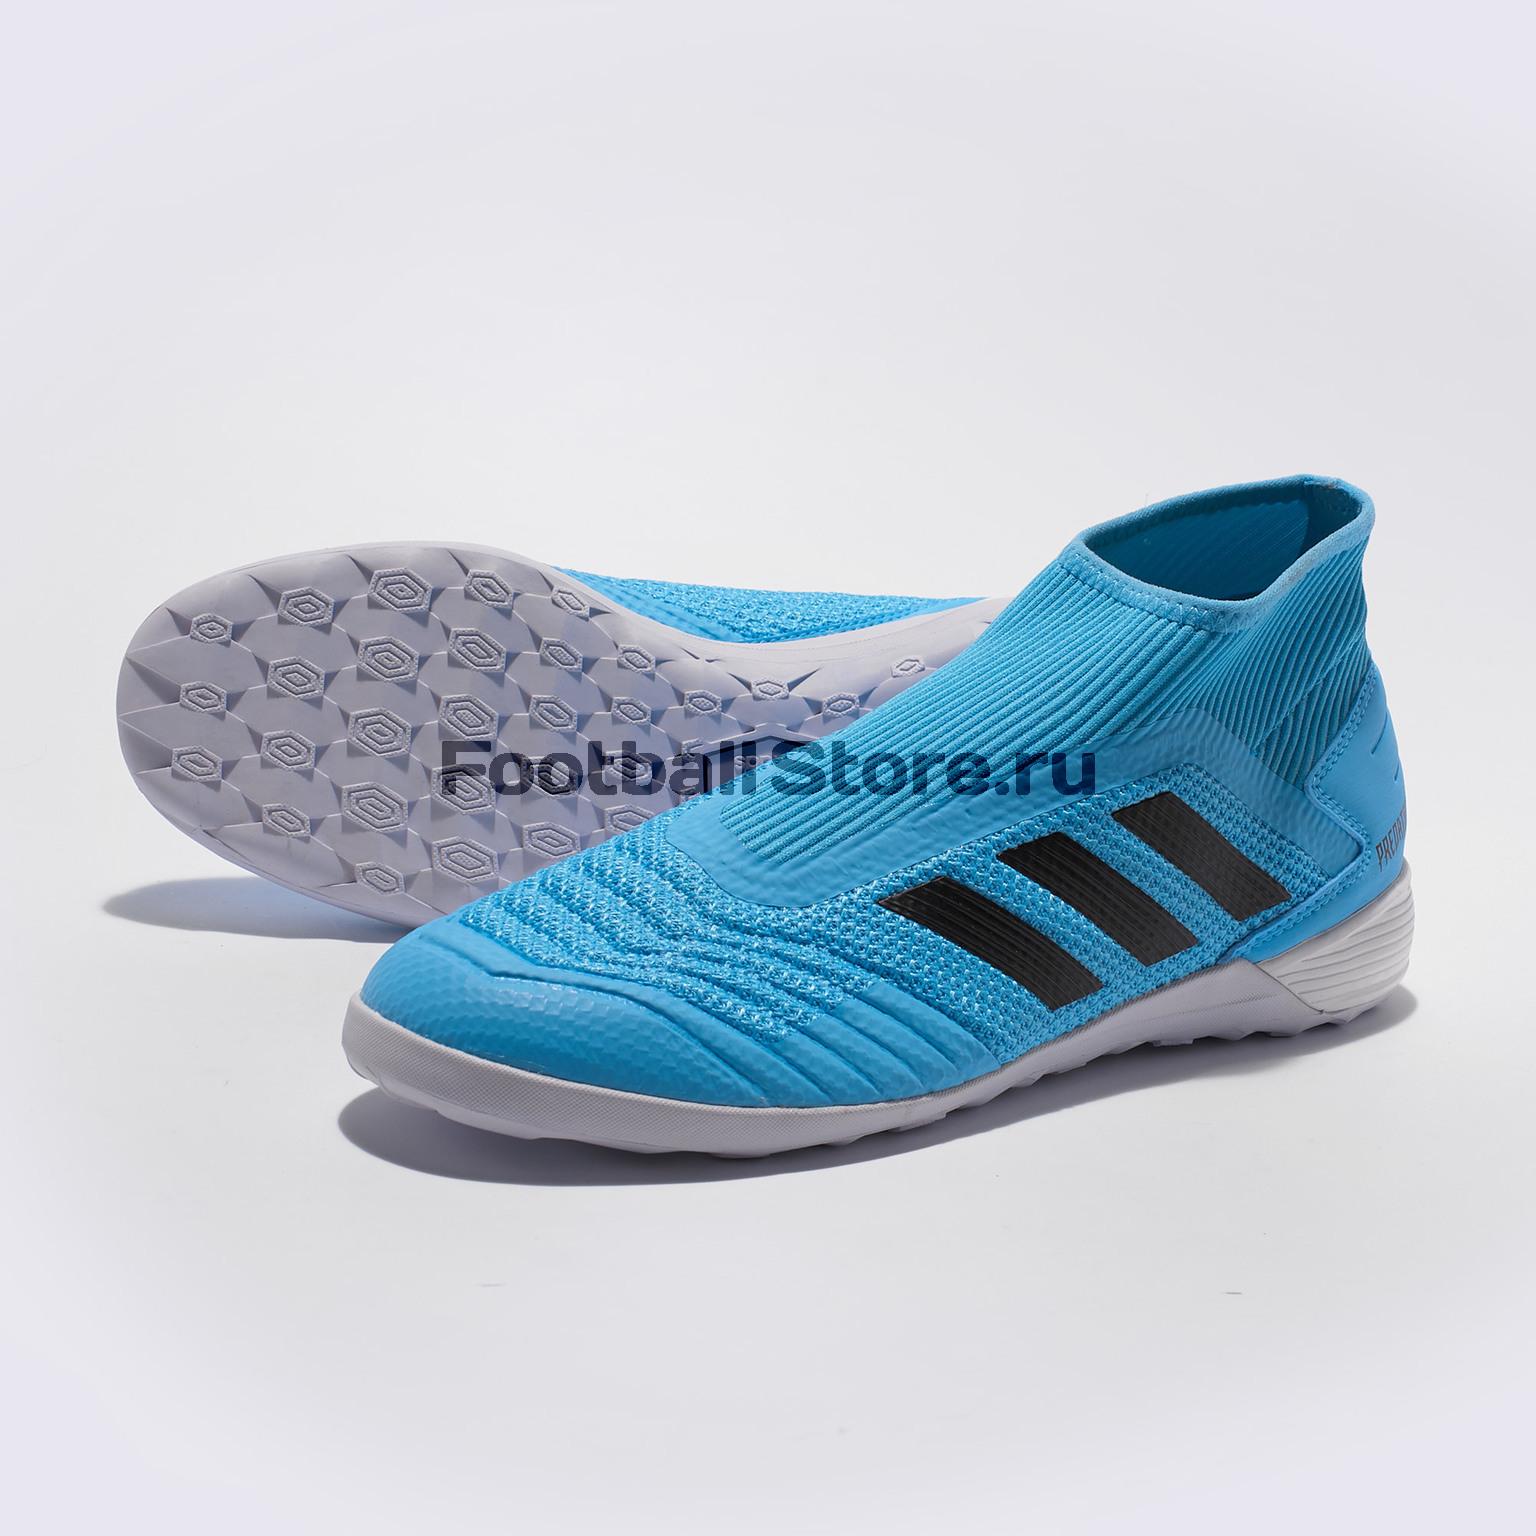 цена на Футзалки Adidas Predator 19.3 LL IN EF0423